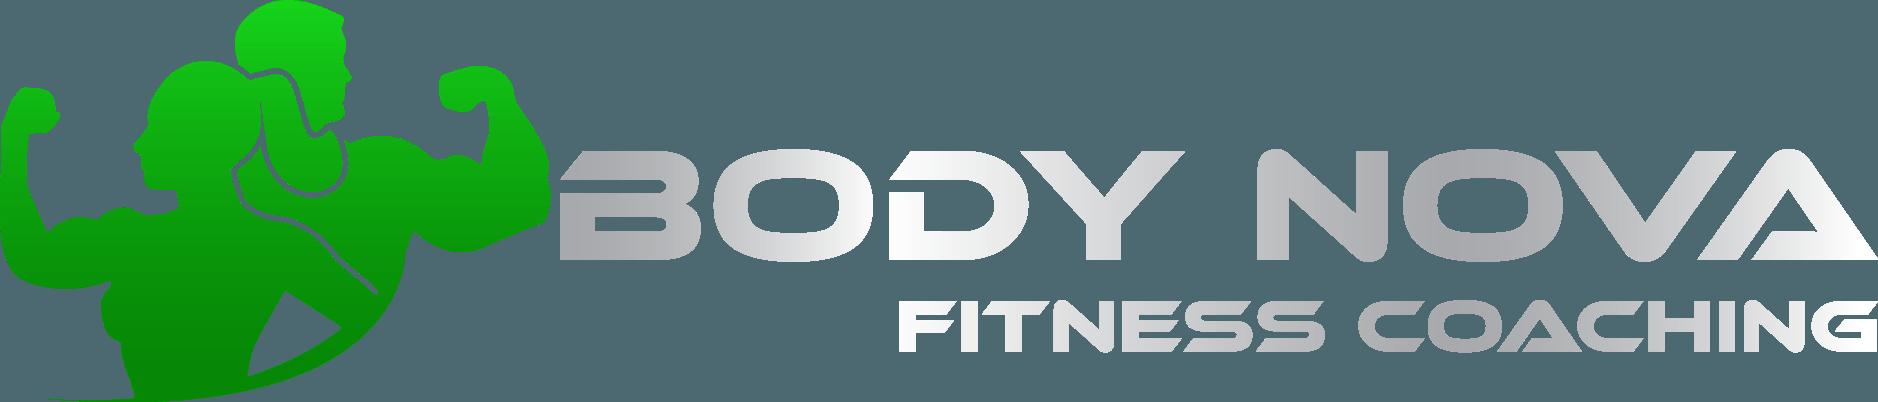 Fitness clipart kinesiology. Body nova coaching online